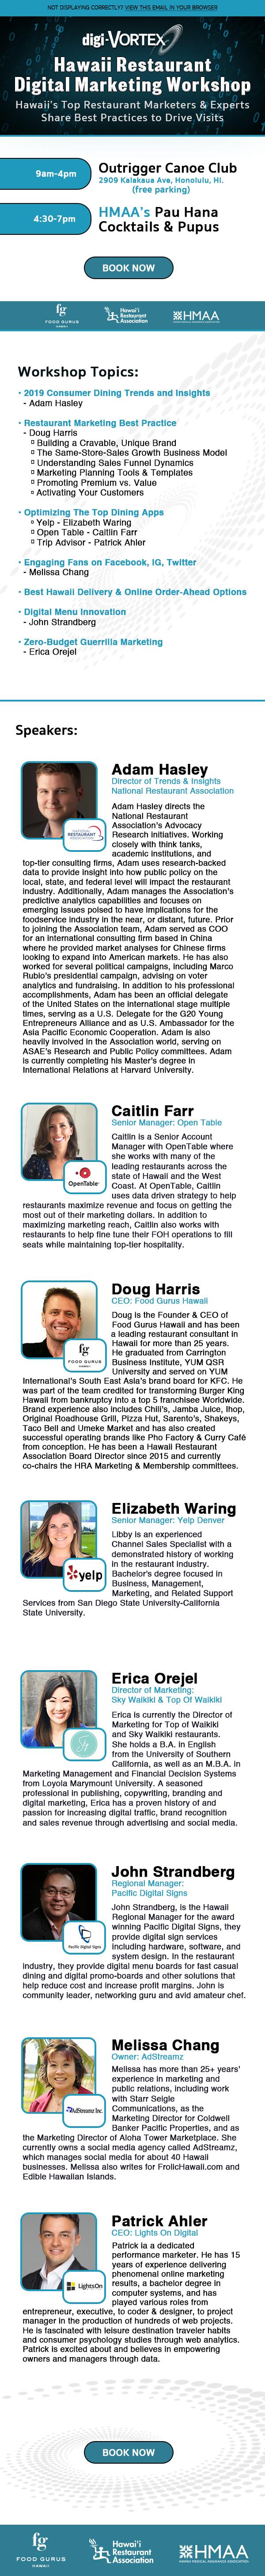 Hawaii Restaurant Digital Marketing Workshop